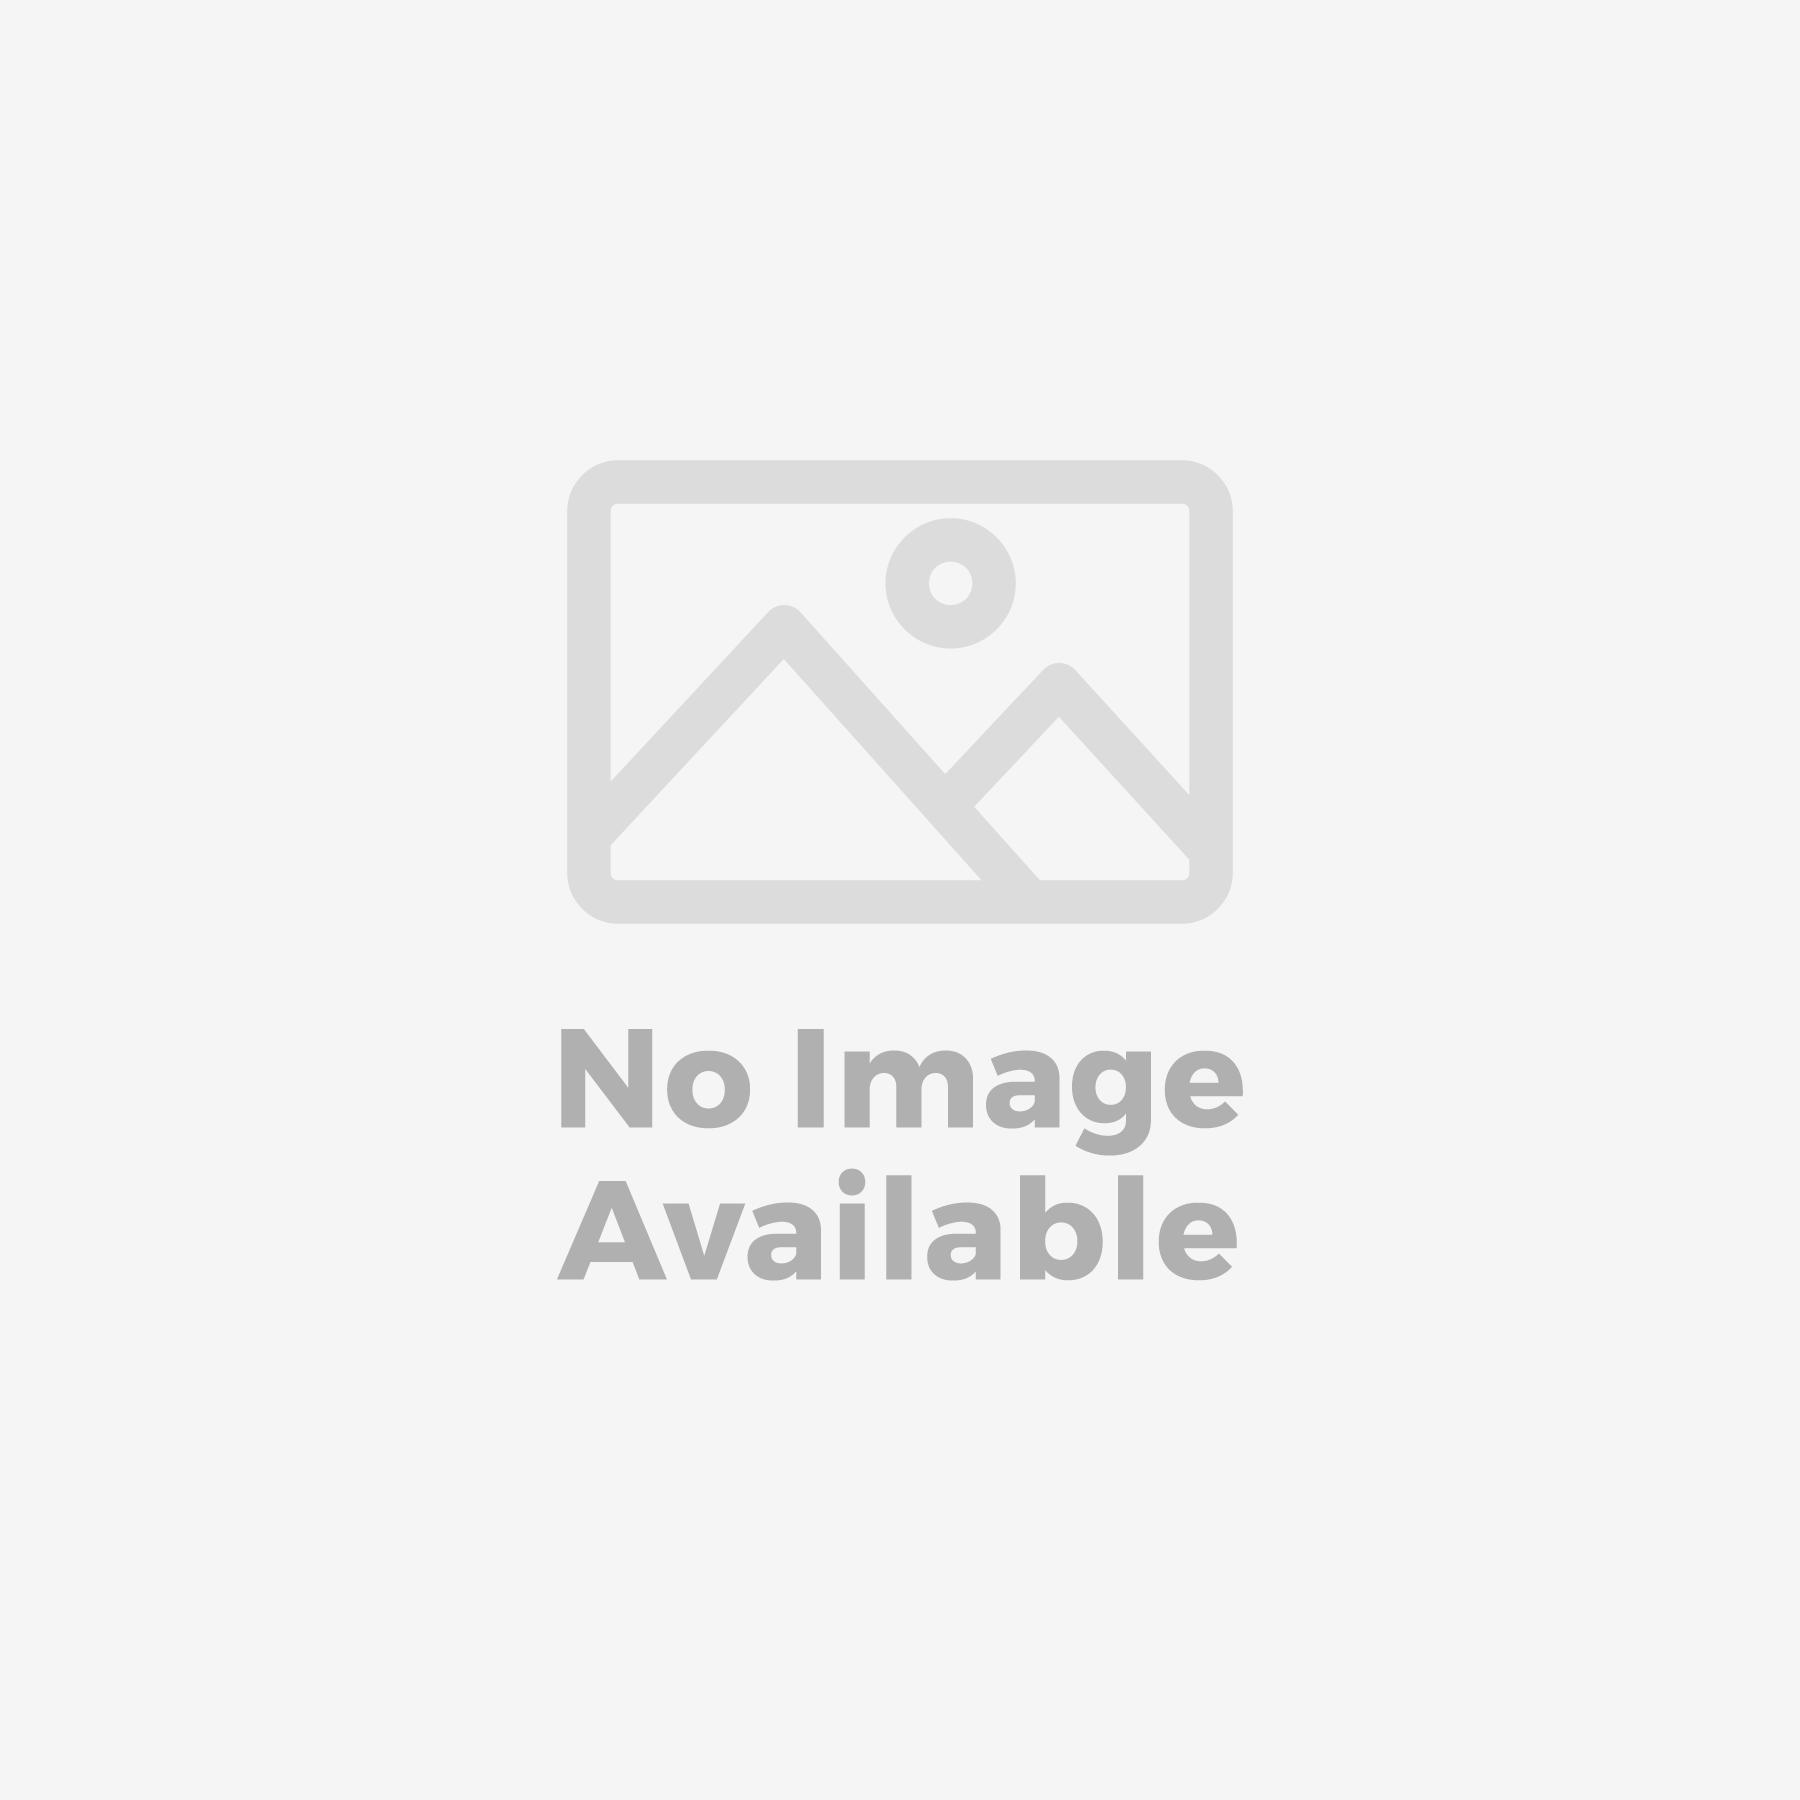 BULLAT FLOOR LAMP